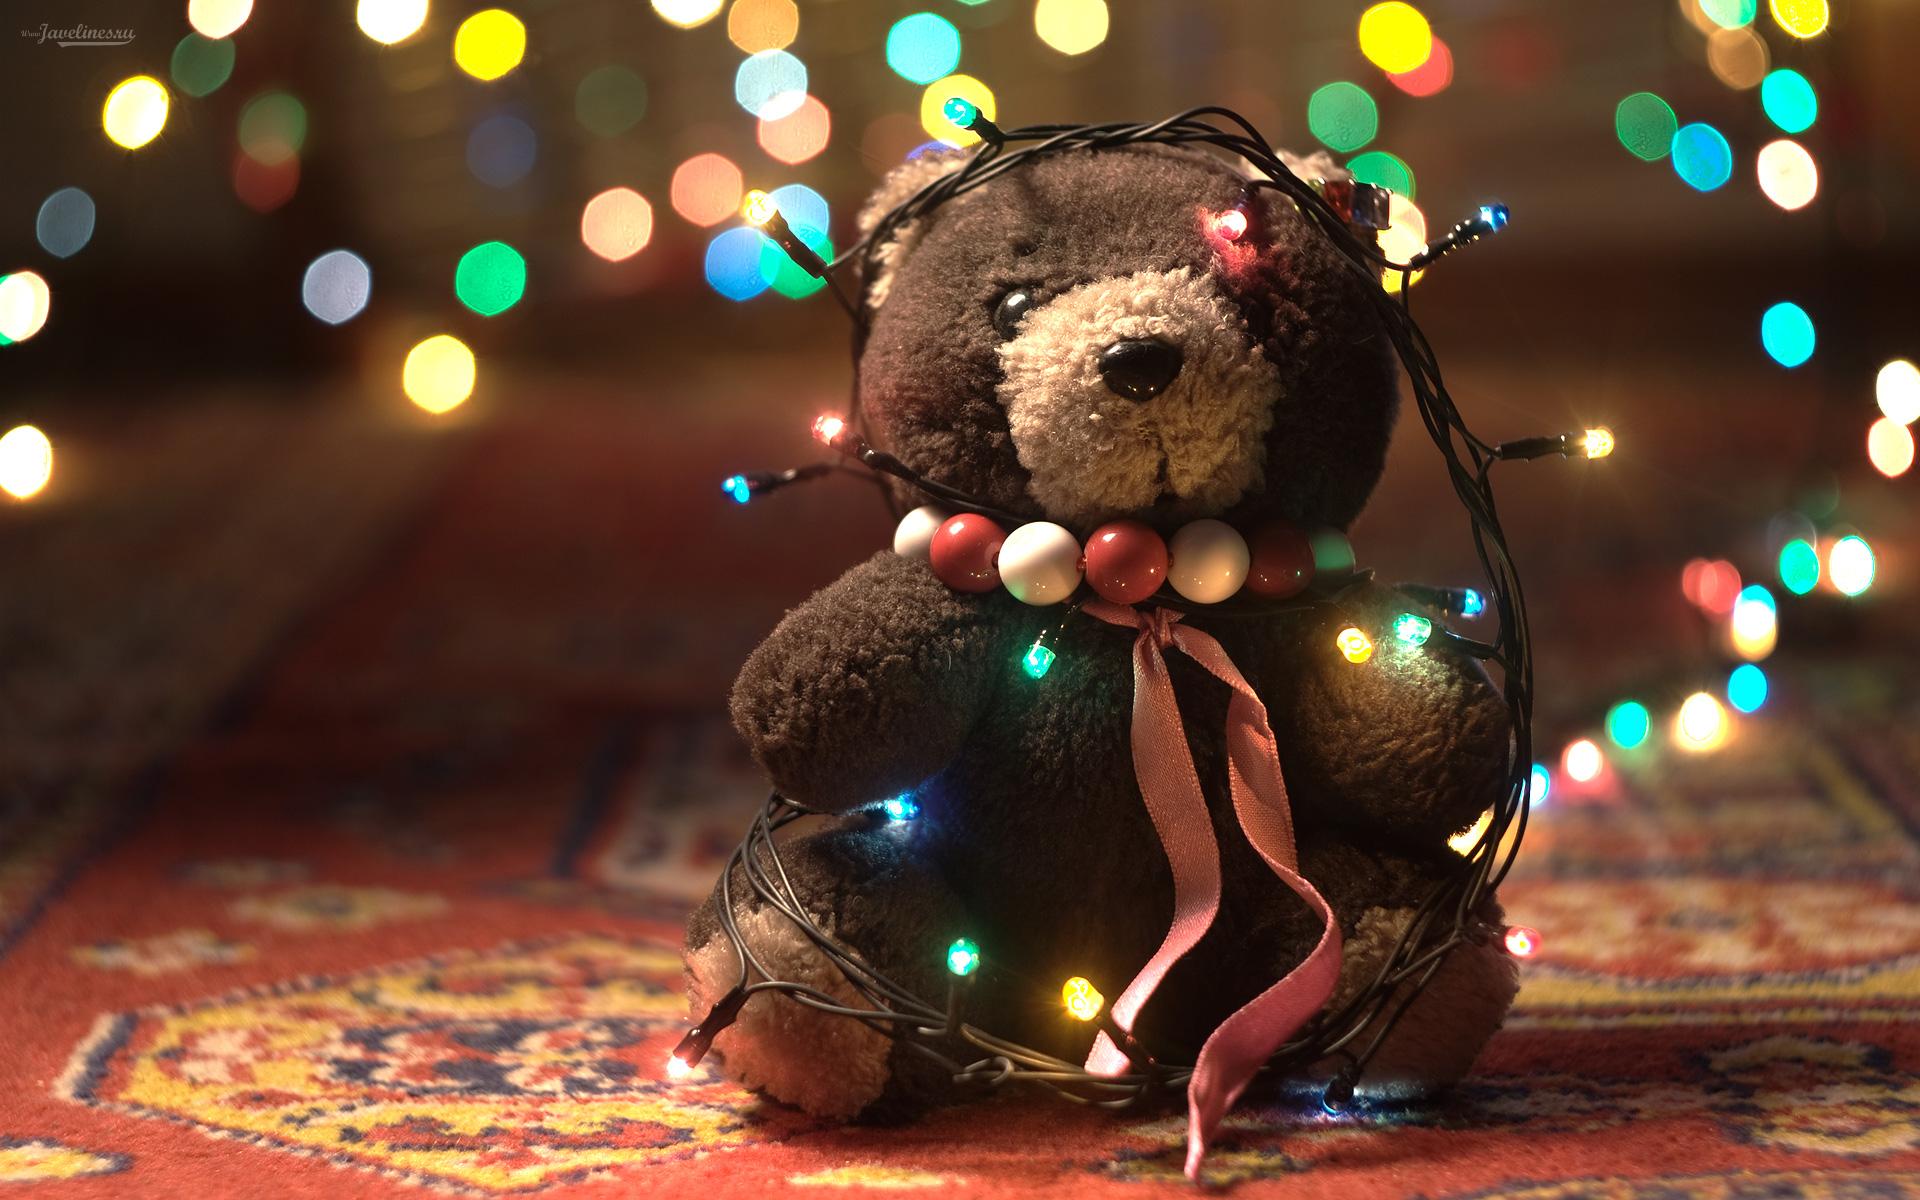 Teddy Bear Hd Wallpaper Wallpapersafari